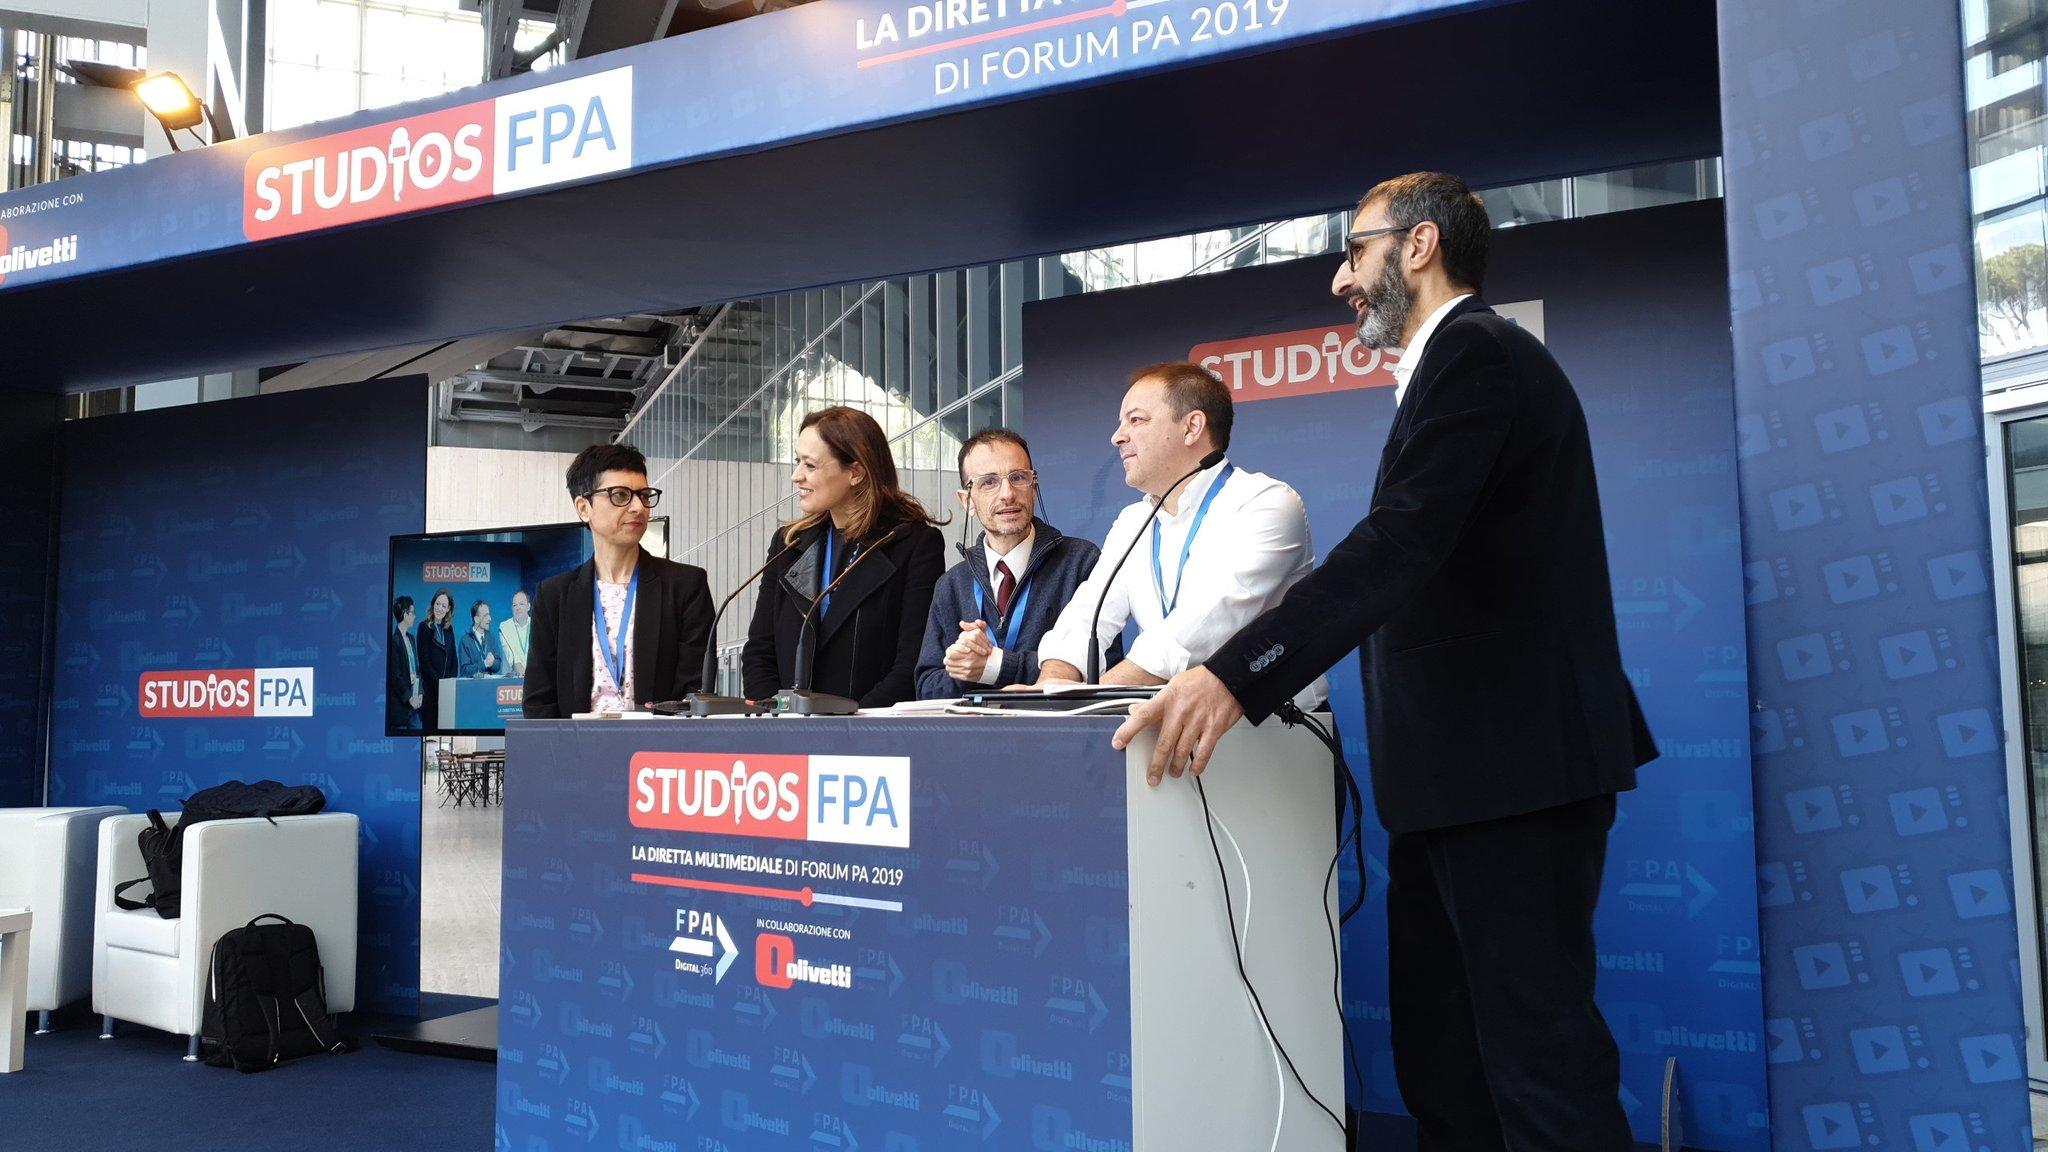 Tra poco Luca Attias in diretta dagli #StudiosFPA a #ForumPA2019 https://t.co/jbvOE1Lfhd